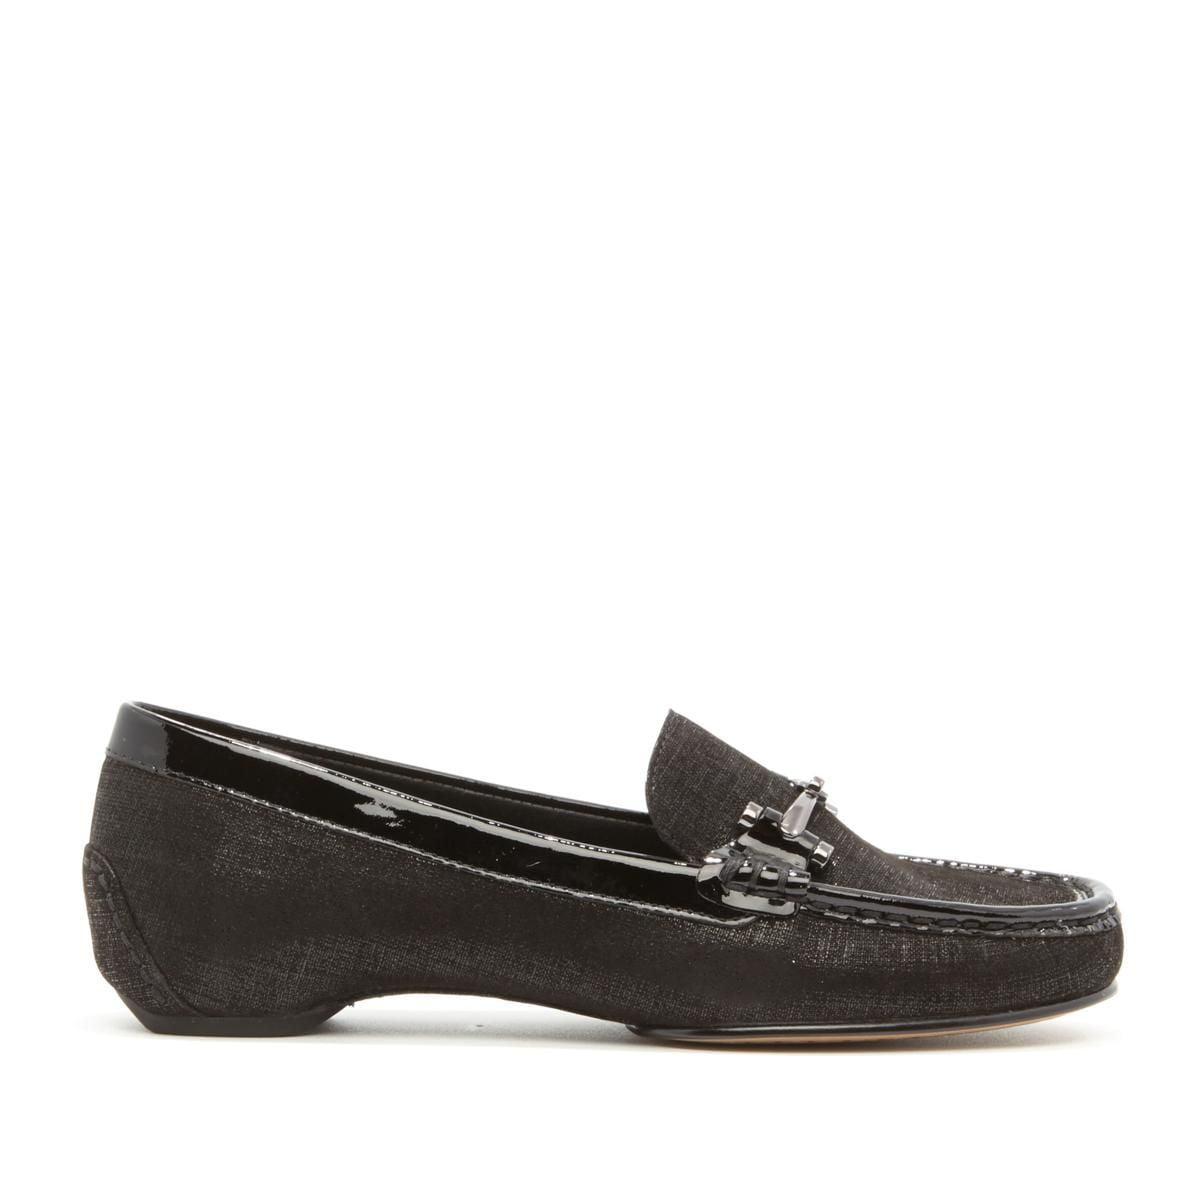 Donald J Pliner Filo Bit Loafer Patent Leather Trim 570-683 by